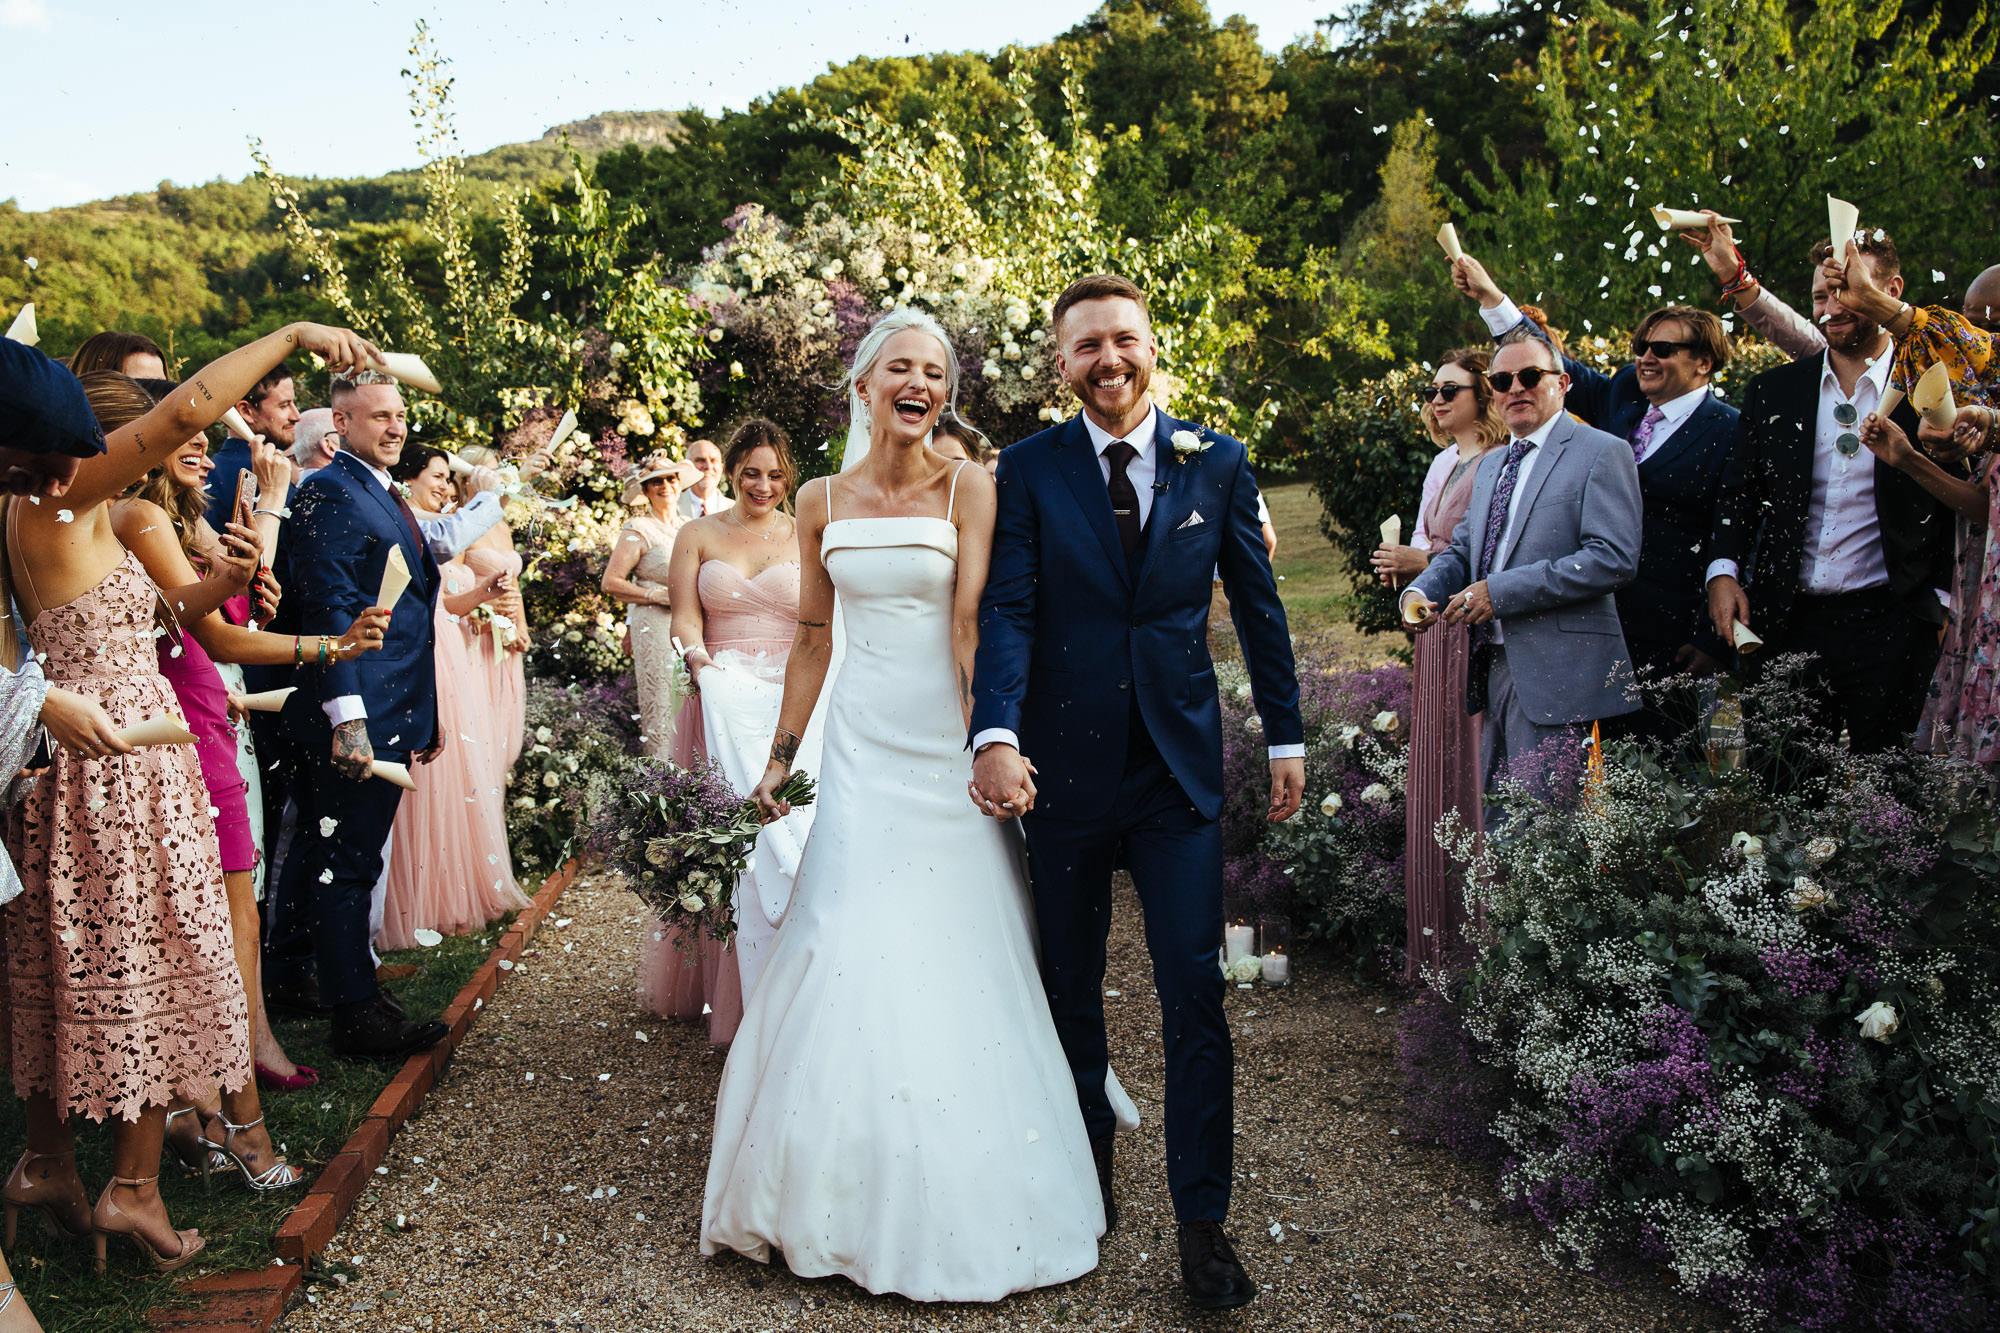 Best Wedding Photography of 2019